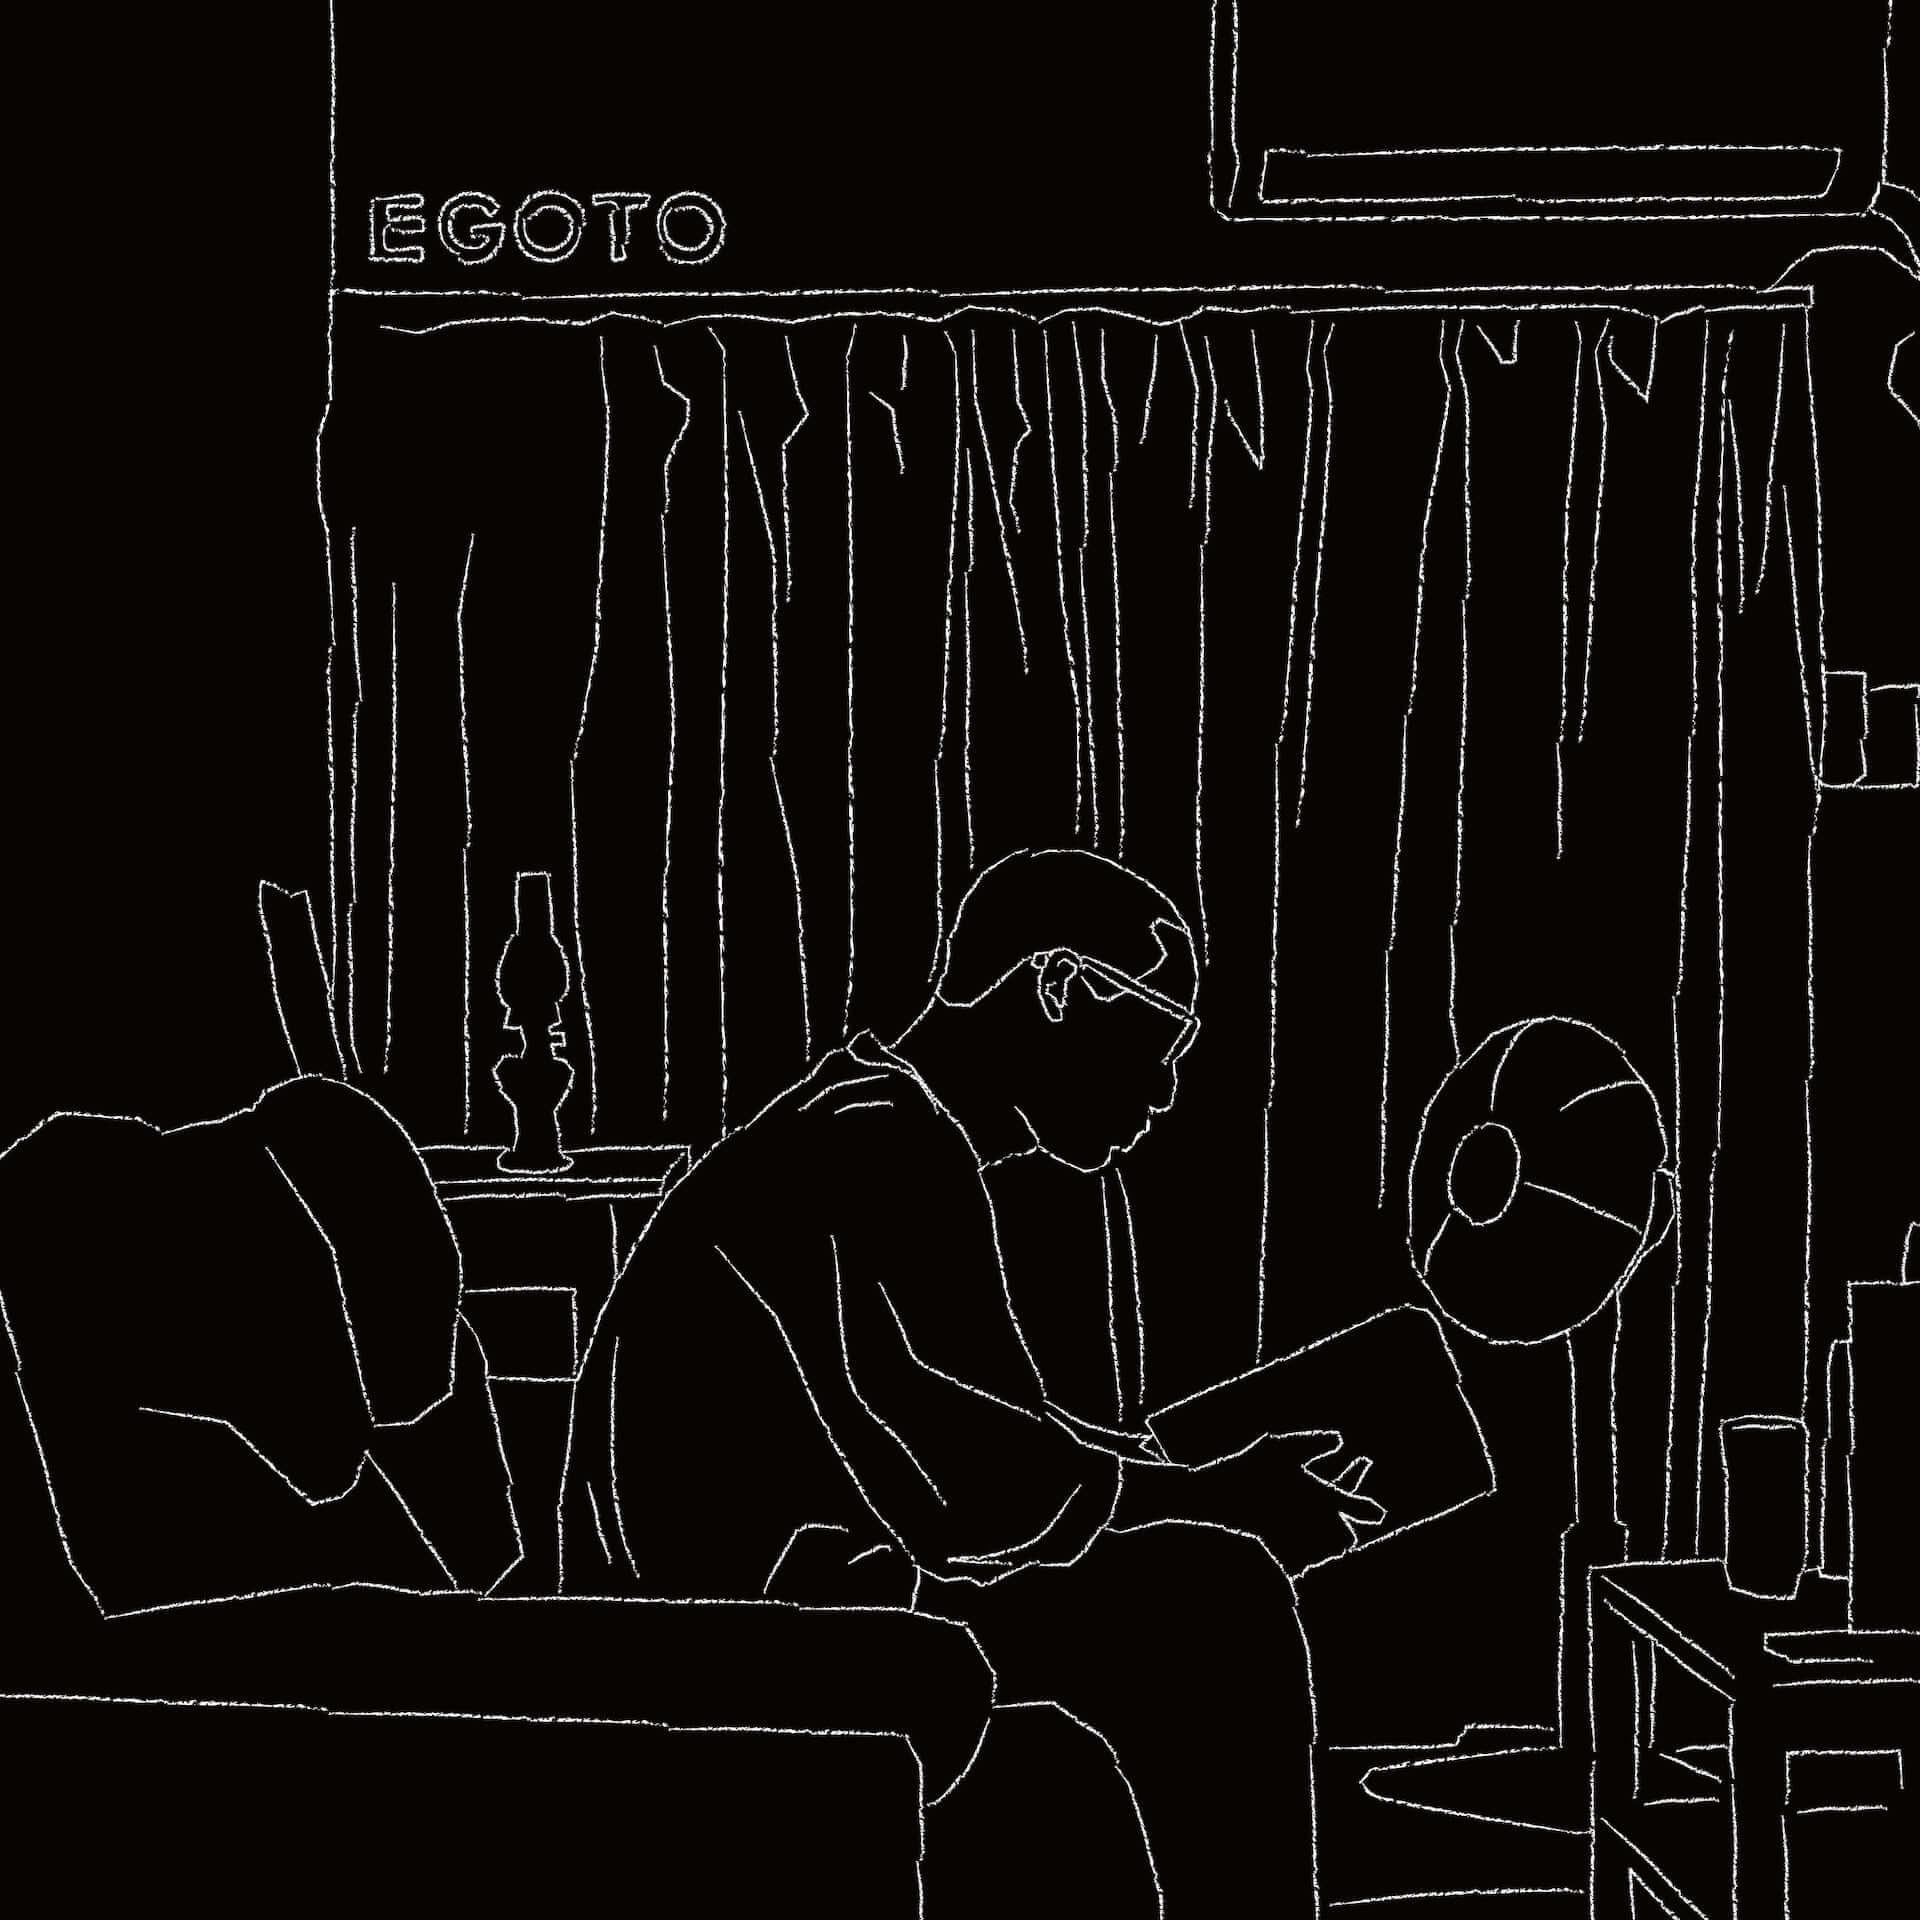 MGF・SIGEMARUが1stソロアルバム『EGOTO』のインスト版をデジタルリリース!曽我部恵一、Bugseed、DJ JUCOらが参加 music210303_sigemaru_1-1920x1920